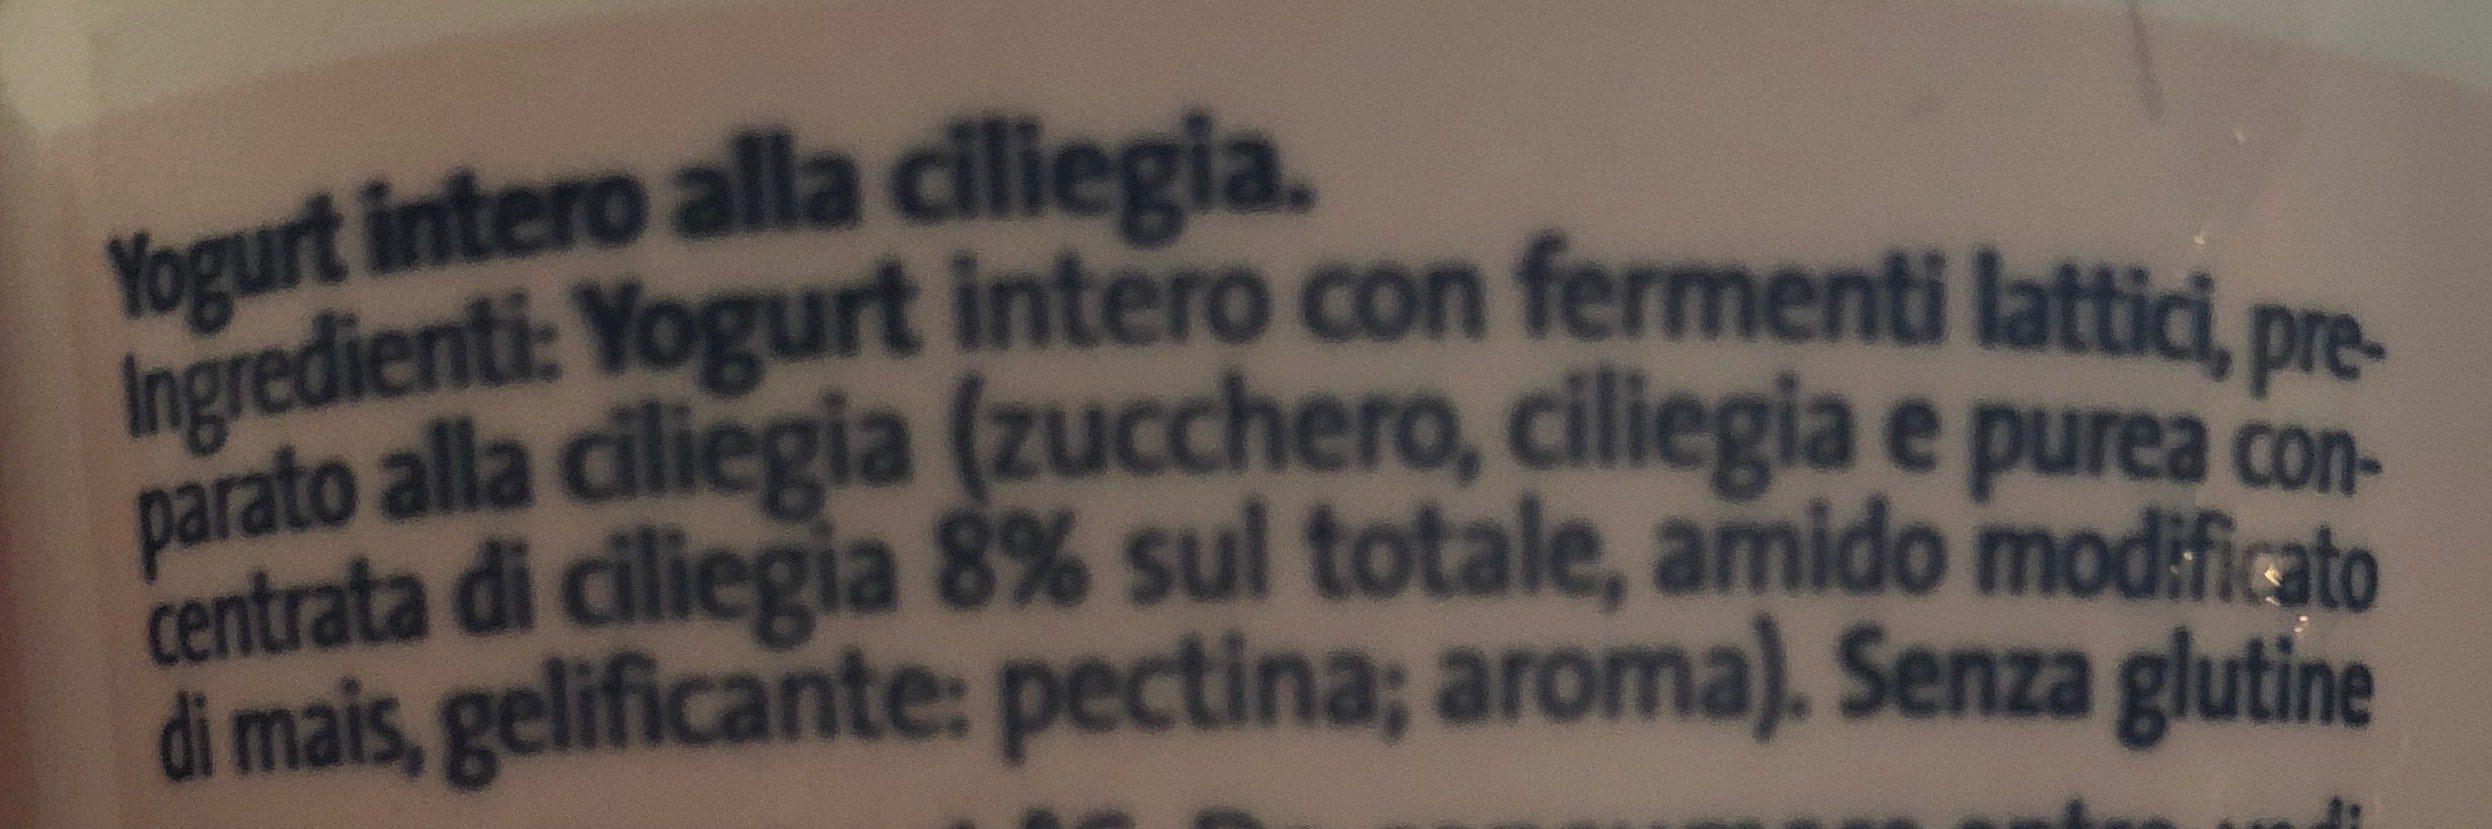 Yogurt ciliegia - Ingredients - it